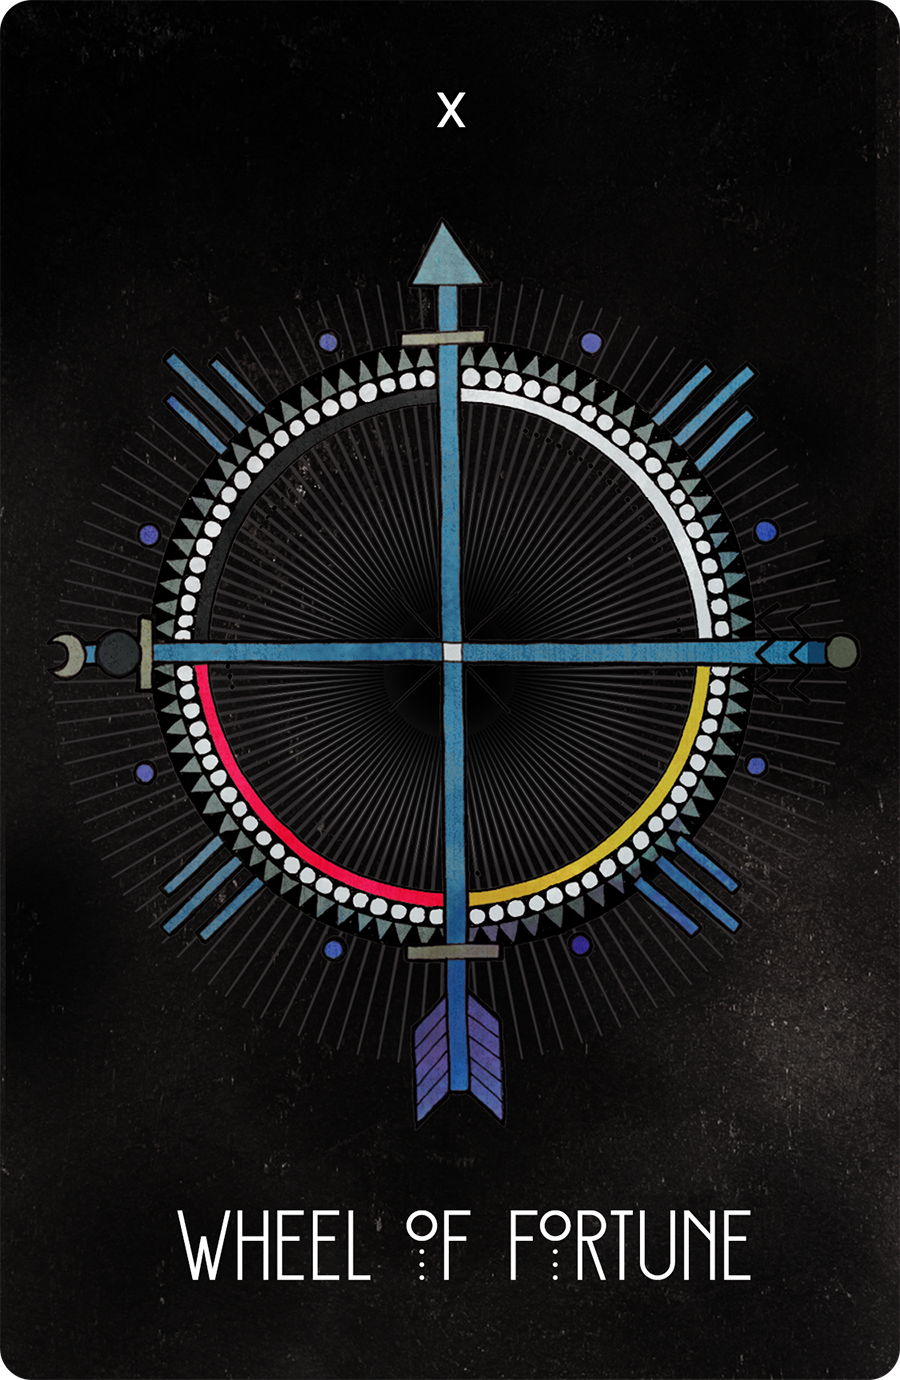 Inspirational Tarot Wheel of Fortune